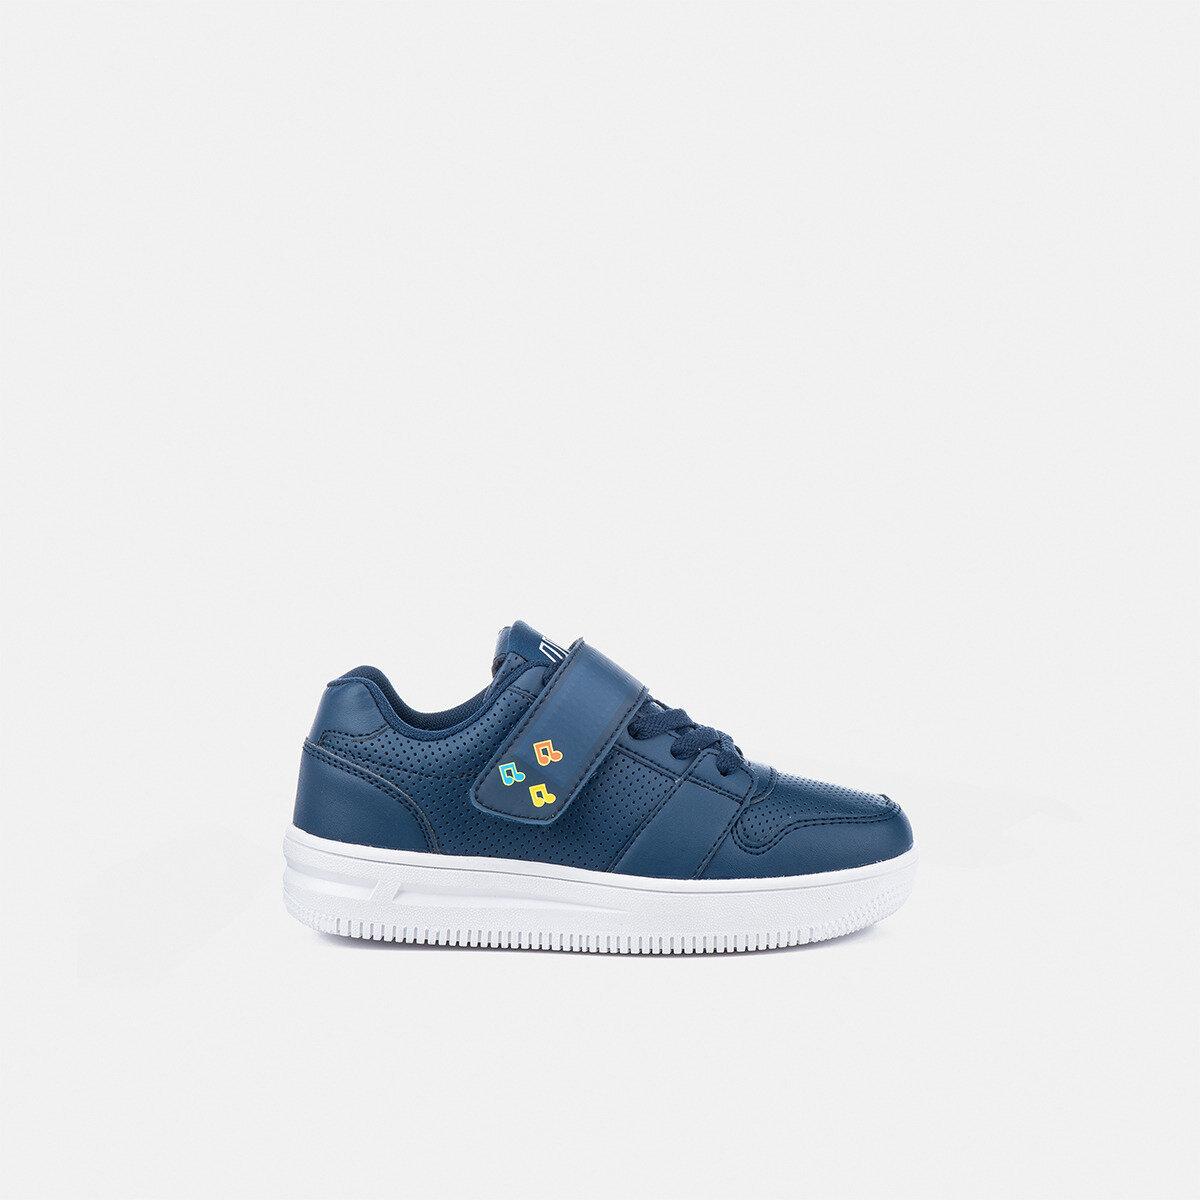 GAME NAVY BLUE Boy Sneakers